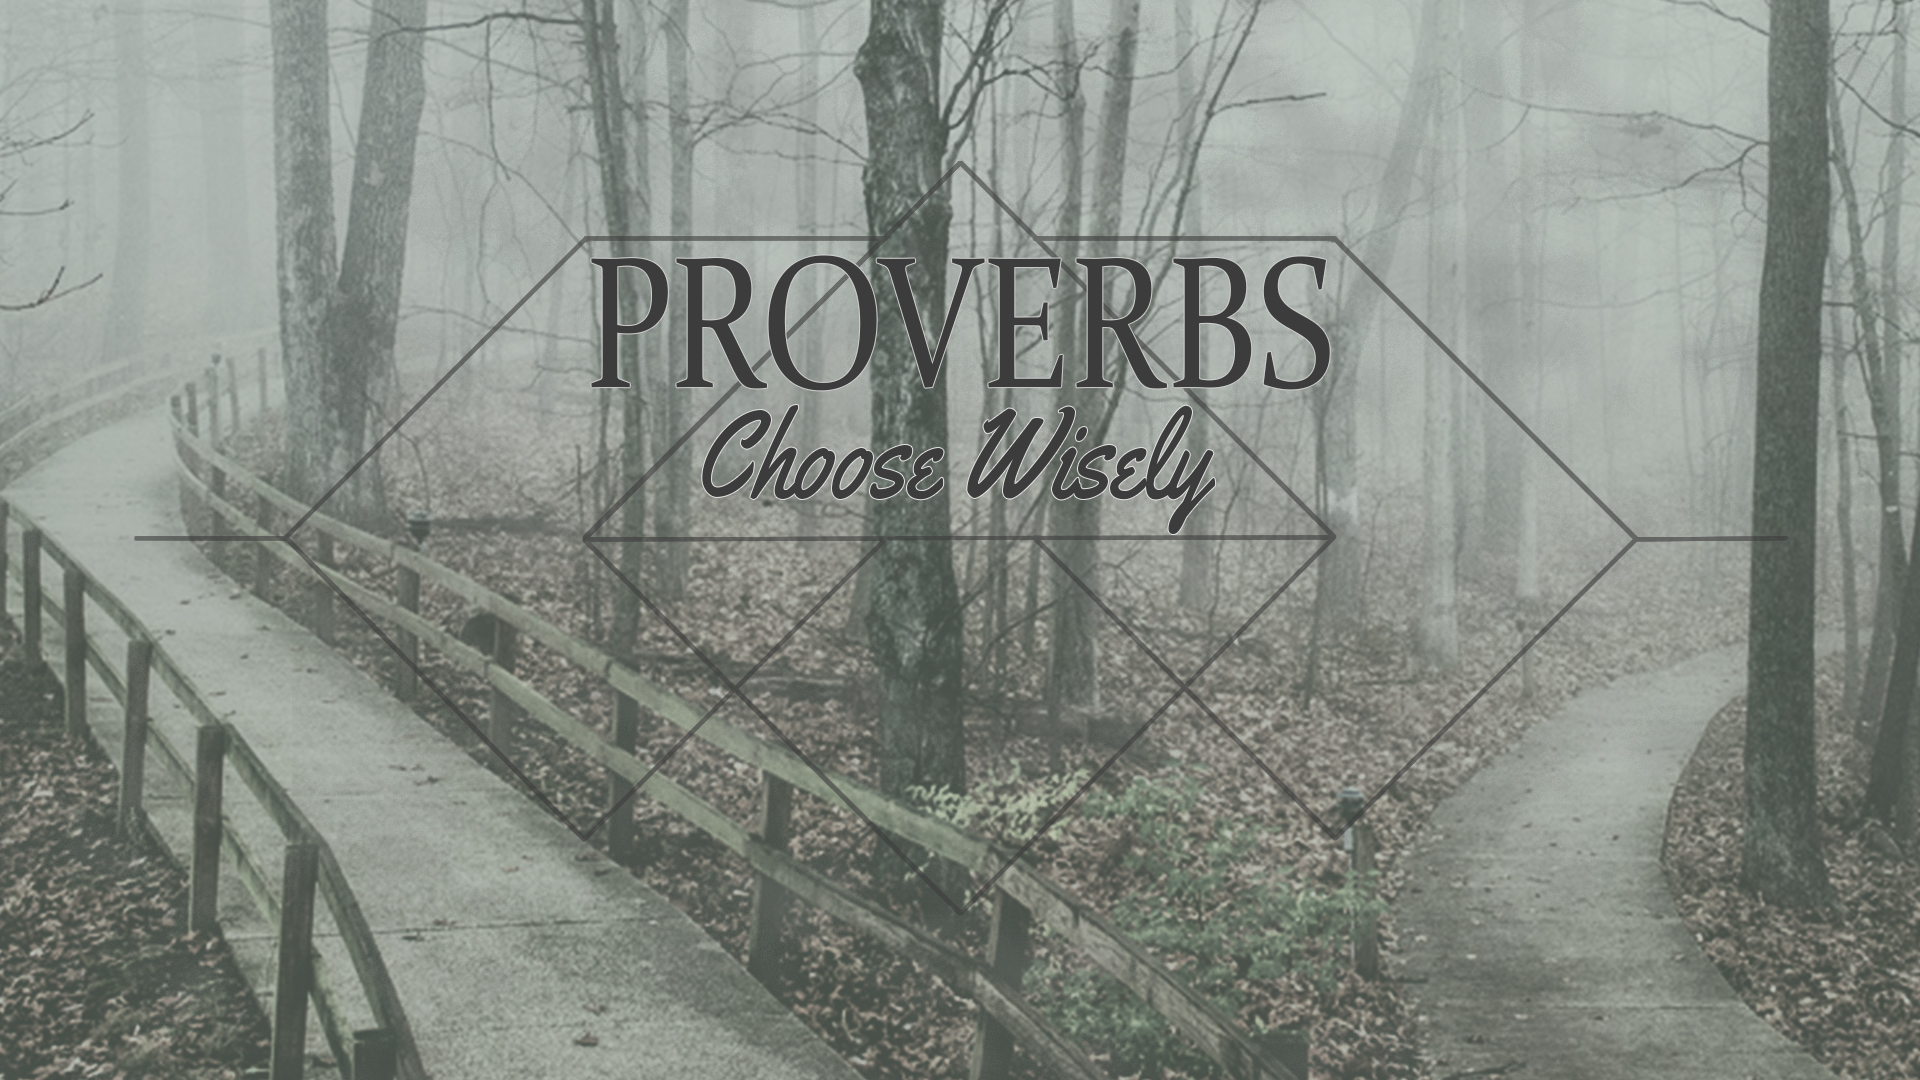 Proverbs Graphic.jpg